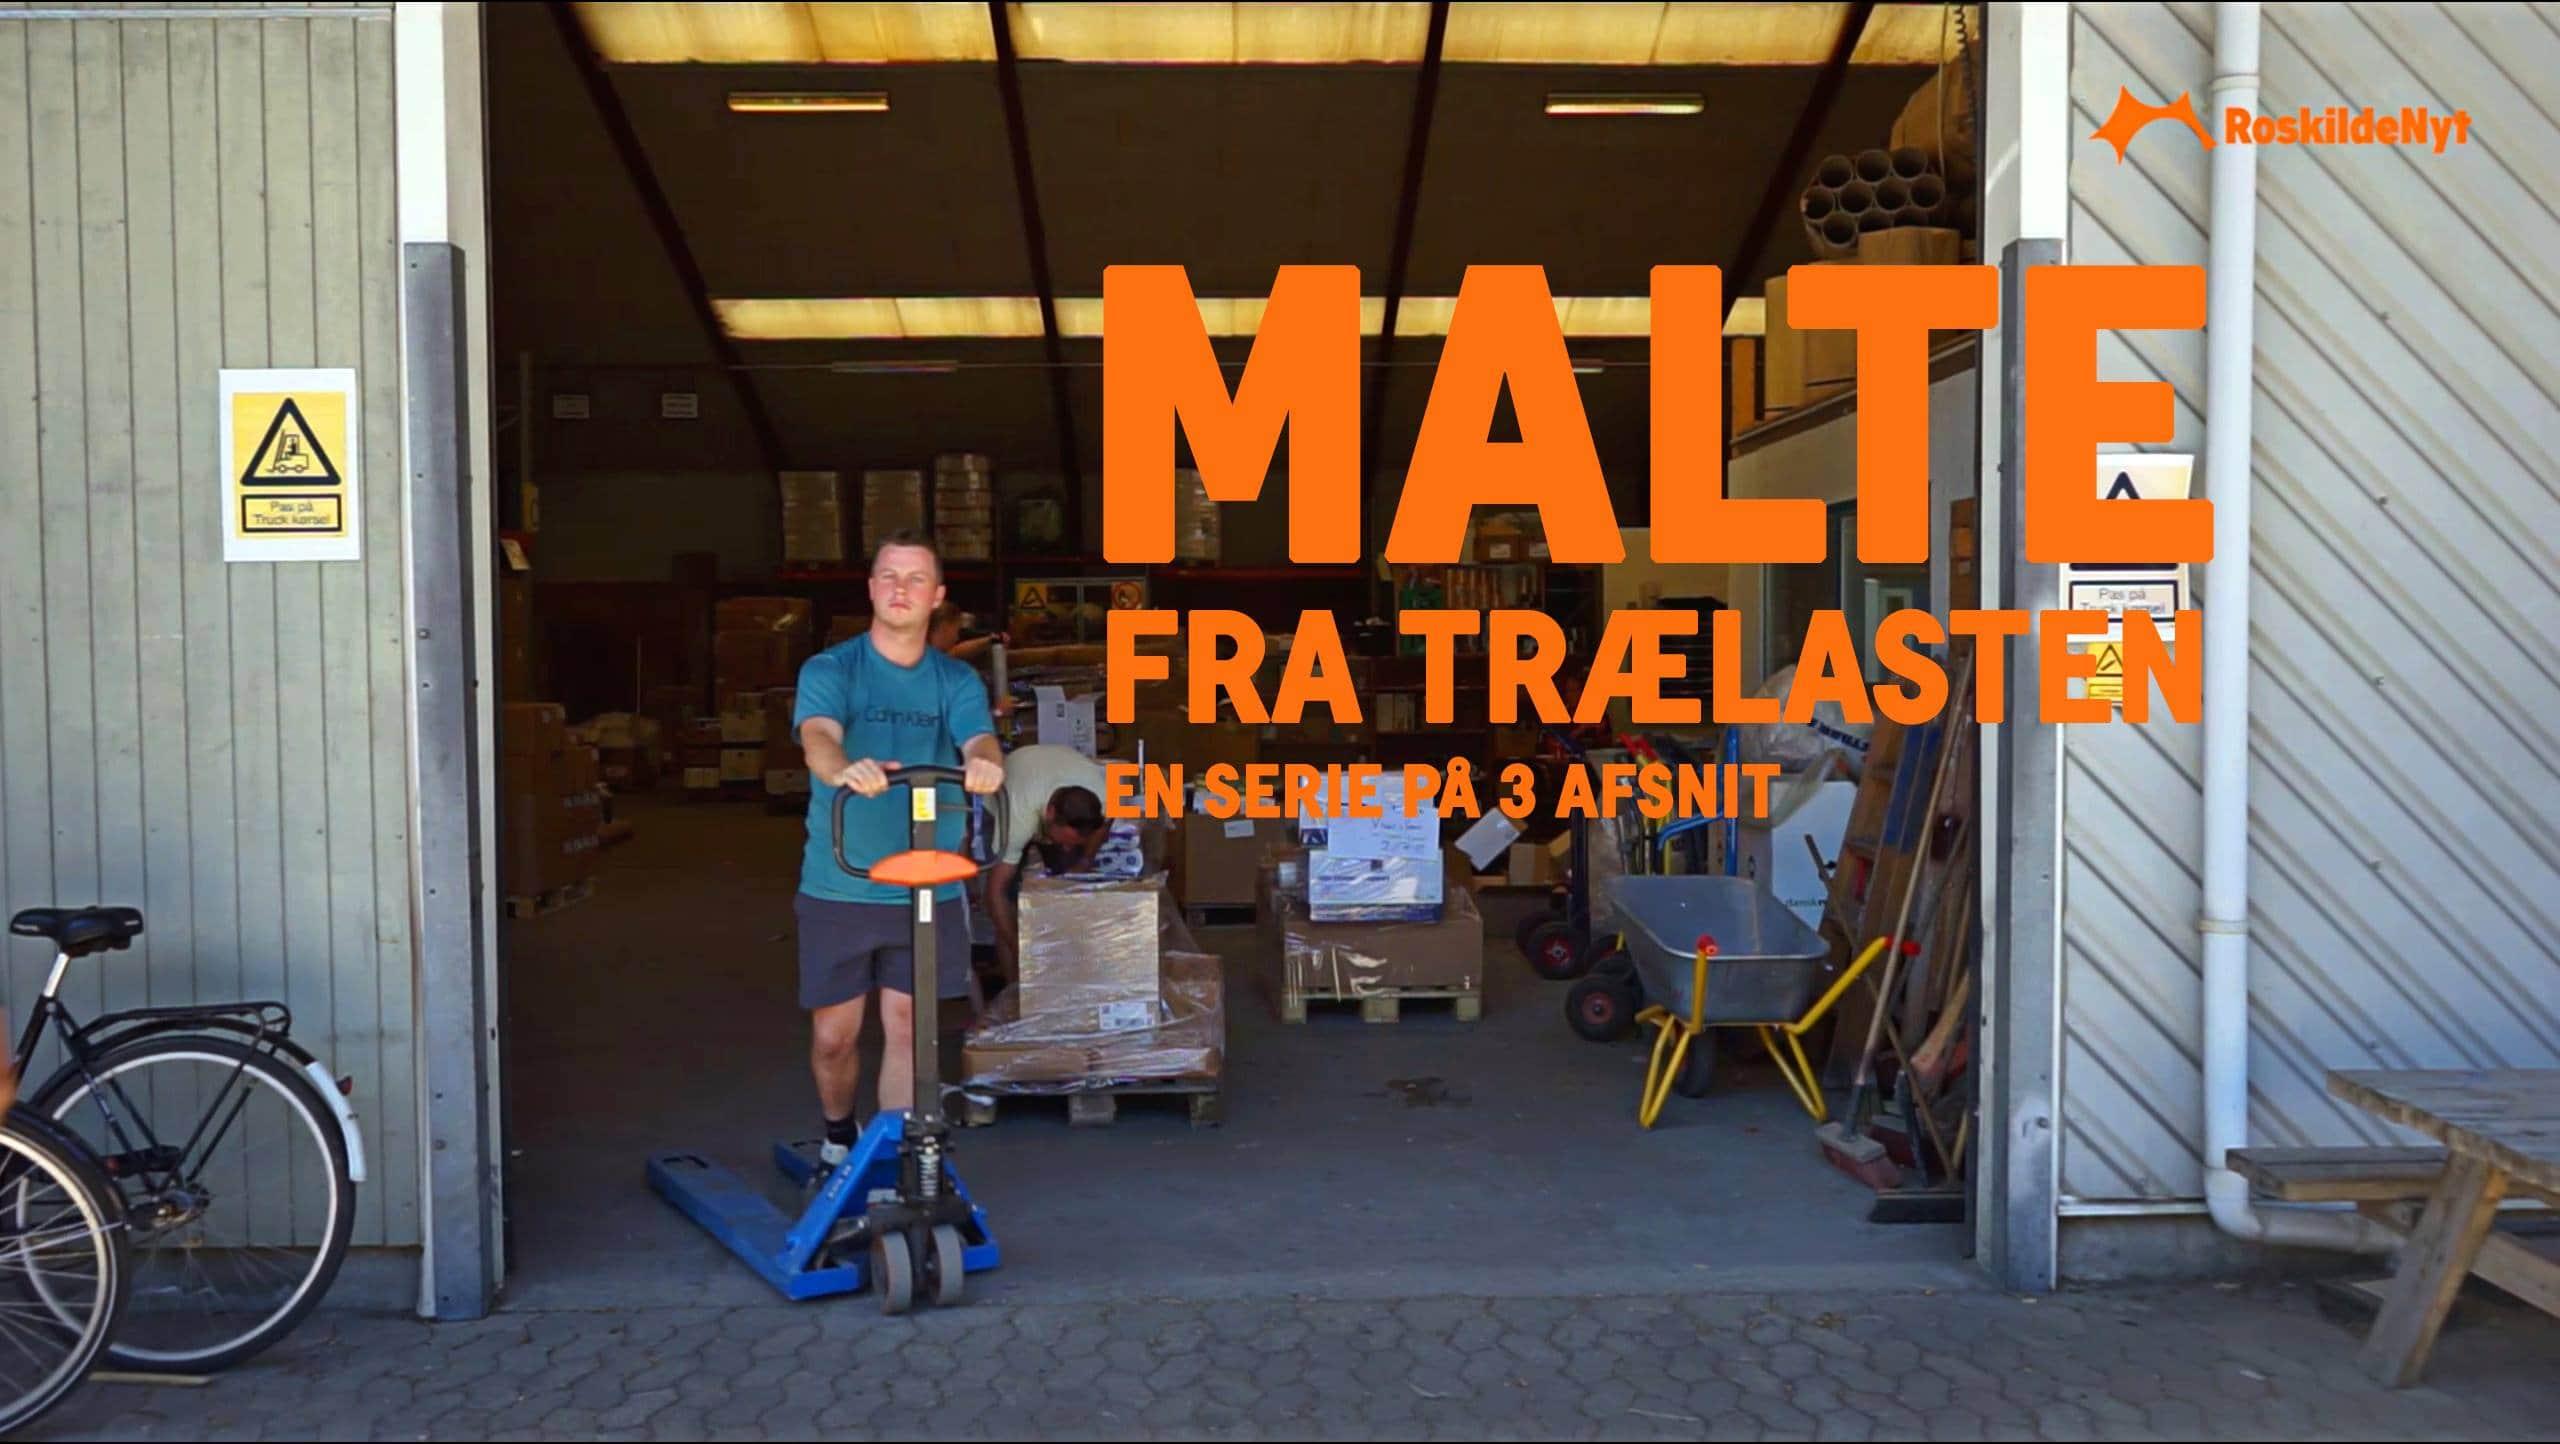 Frivillig på festival: Malte fra trælasten tjekker ind